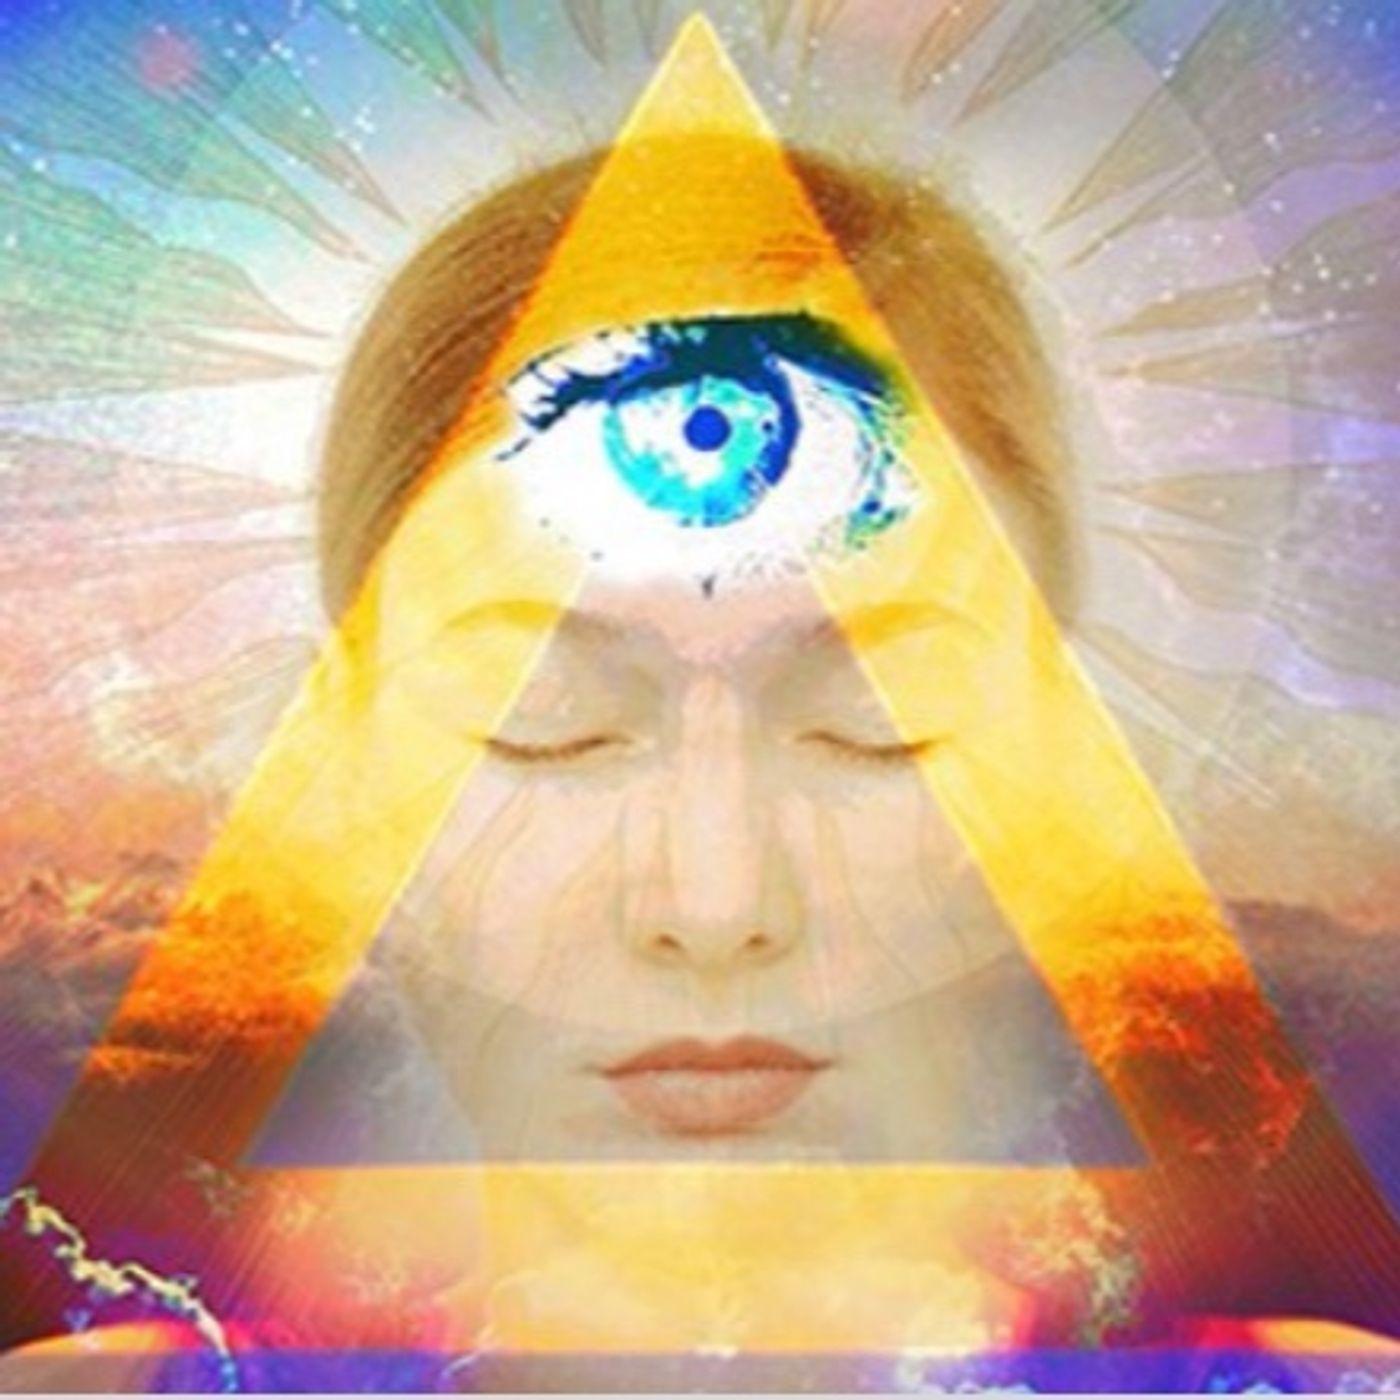 Intuition, meditation and manifestation